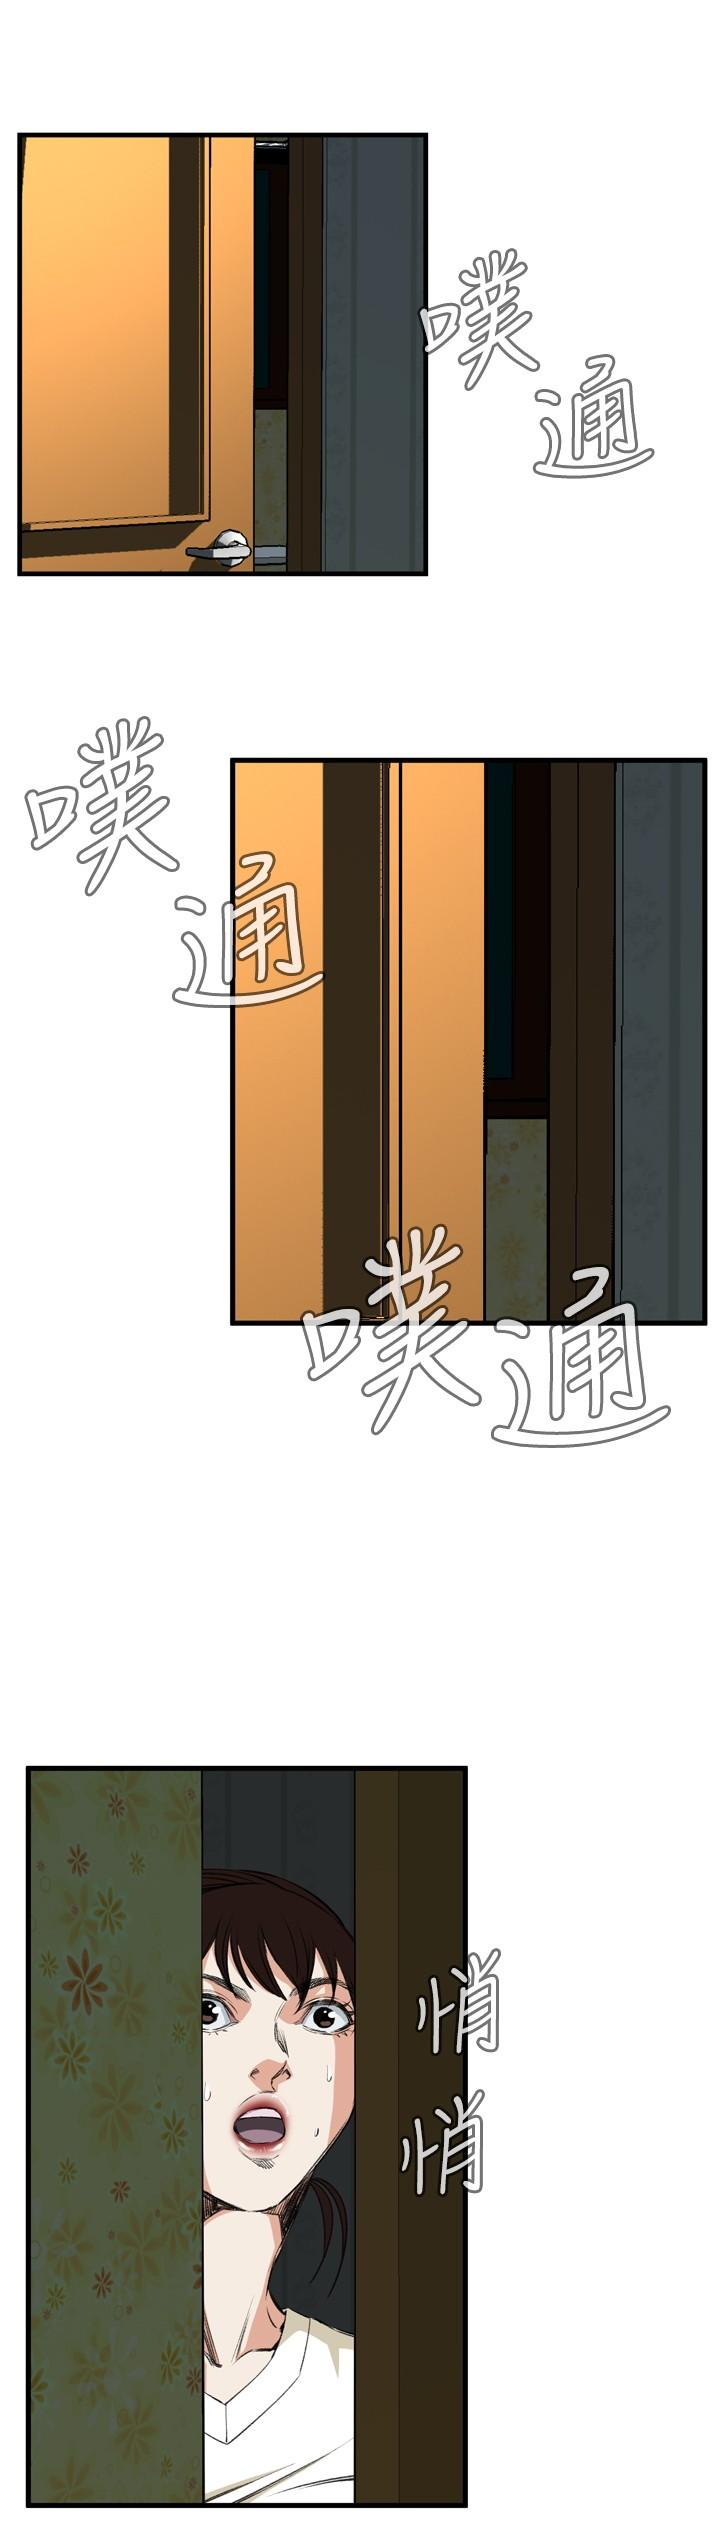 Take a Peek 偷窥 Ch.39~51 [Chinese]中文 159